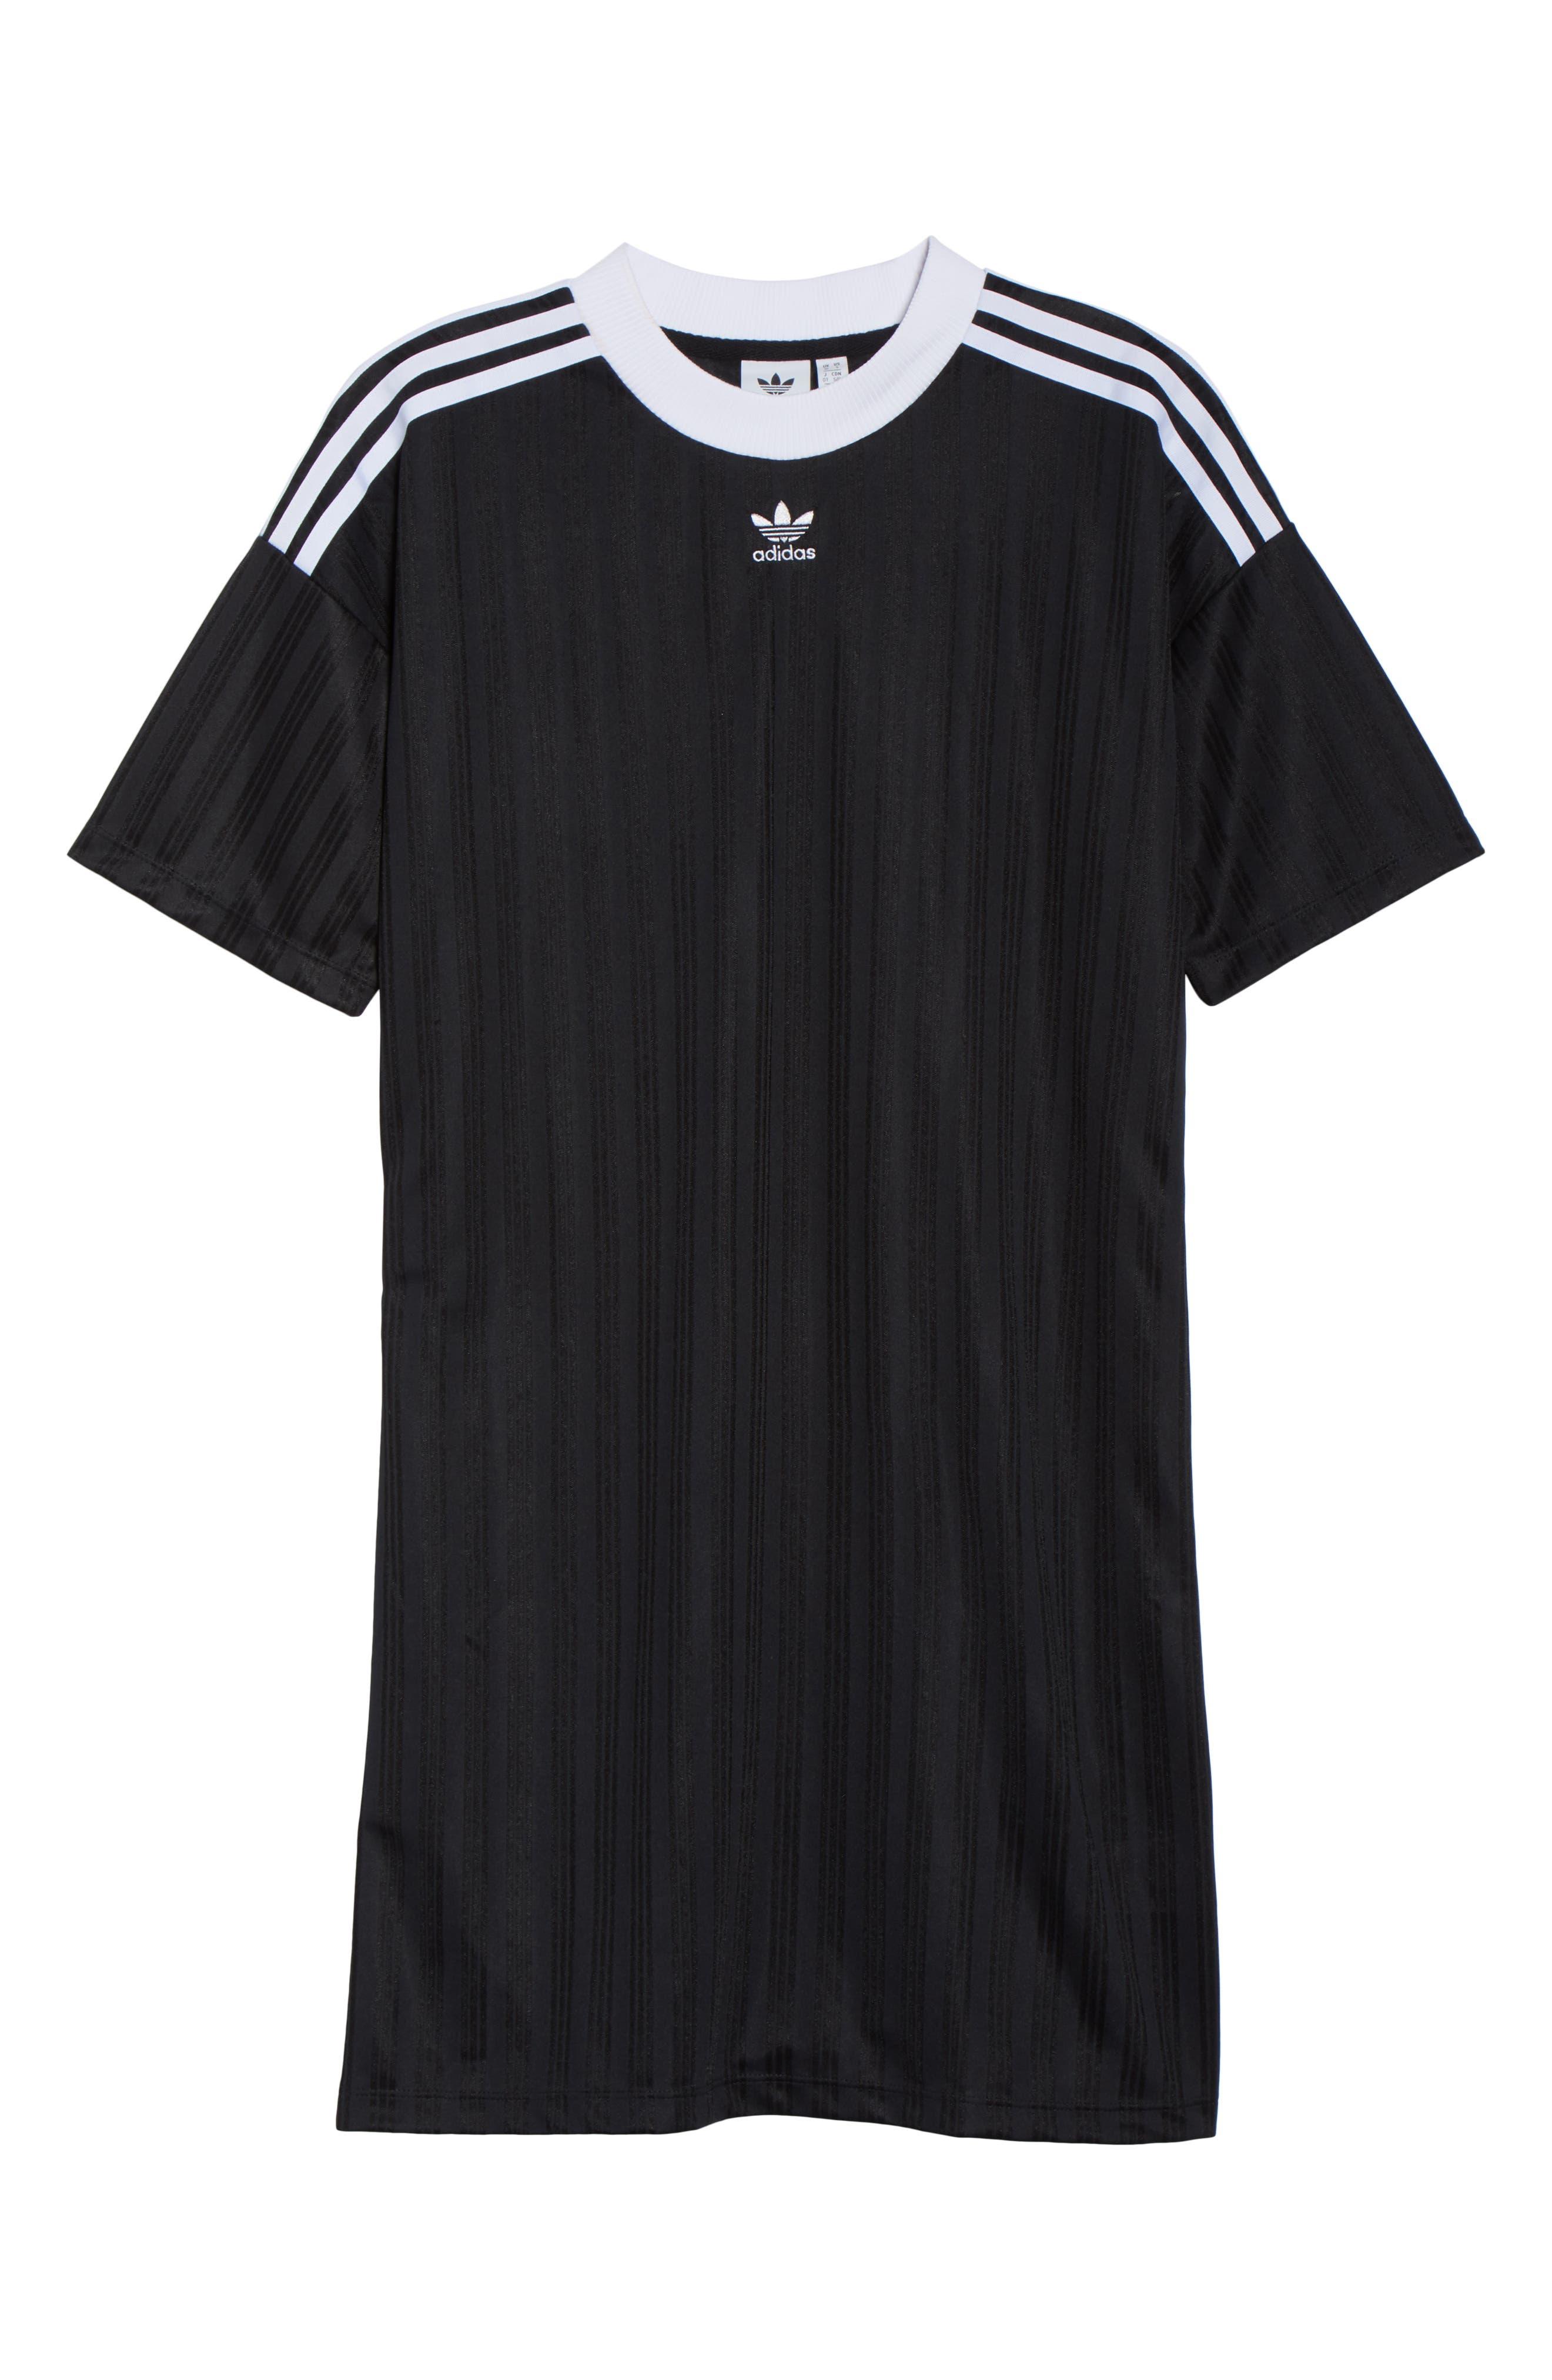 ADIDAS ORIGINALS,                             Trefoil T-Shirt Dress,                             Alternate thumbnail 8, color,                             001